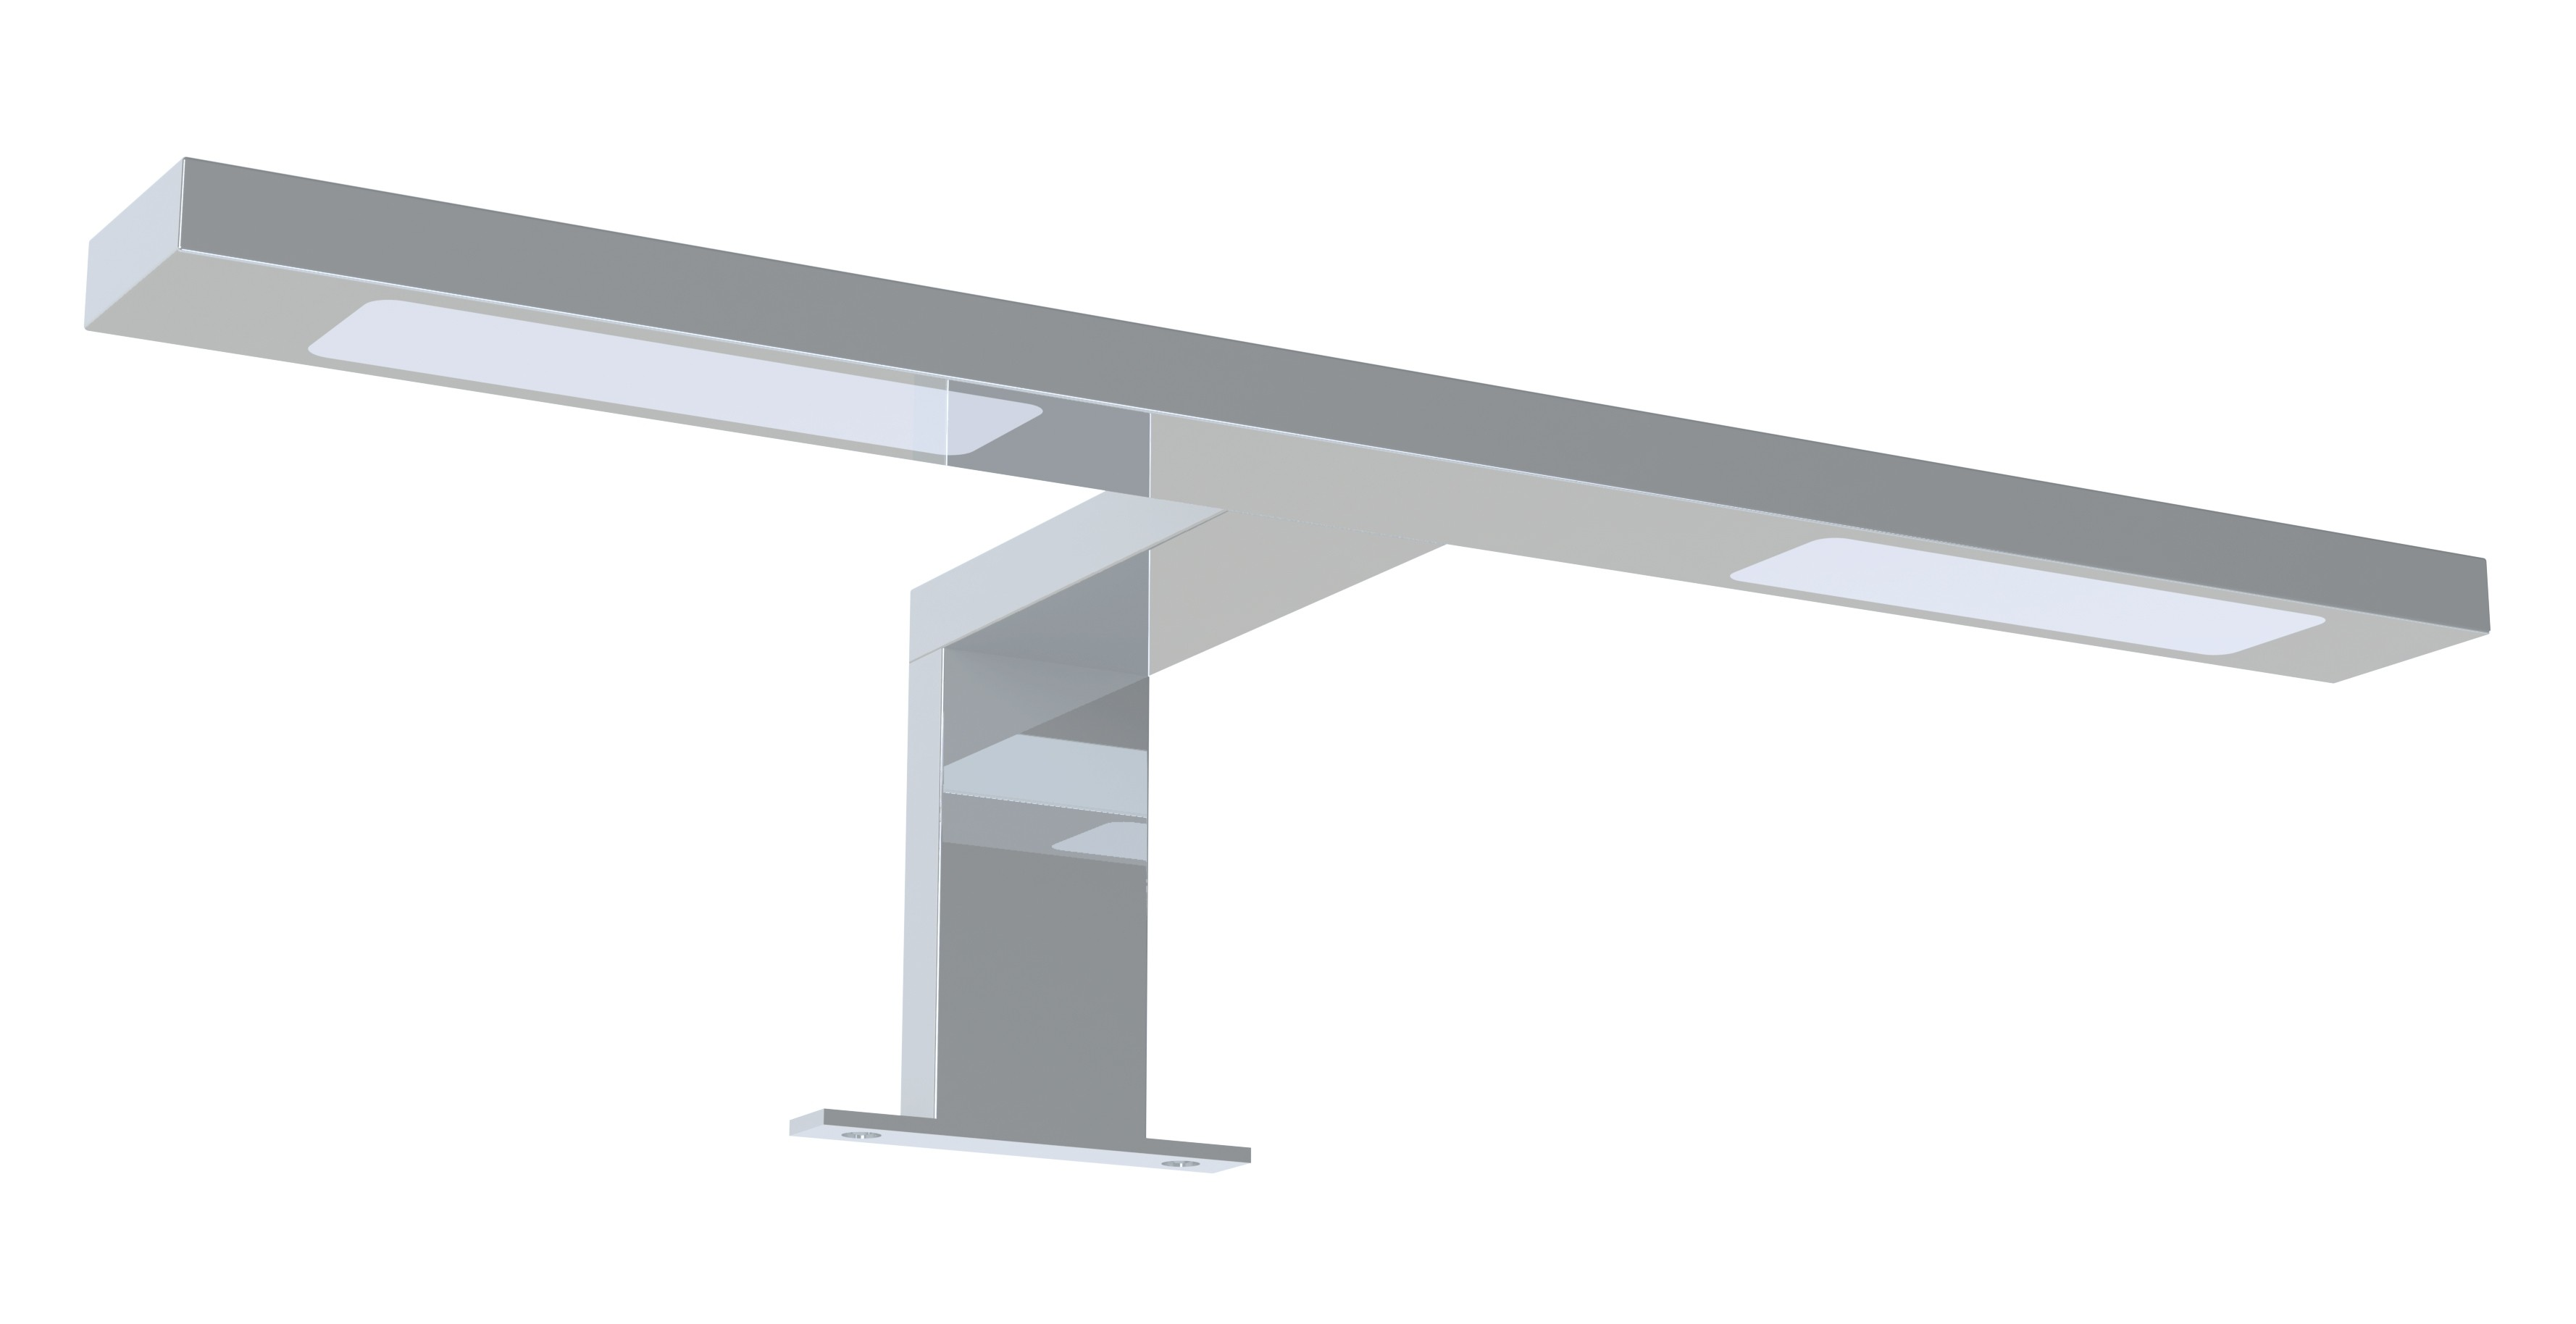 101 luminaire salle de bain ikea applique murale salle de bain ikea salle de bain id es ikea. Black Bedroom Furniture Sets. Home Design Ideas